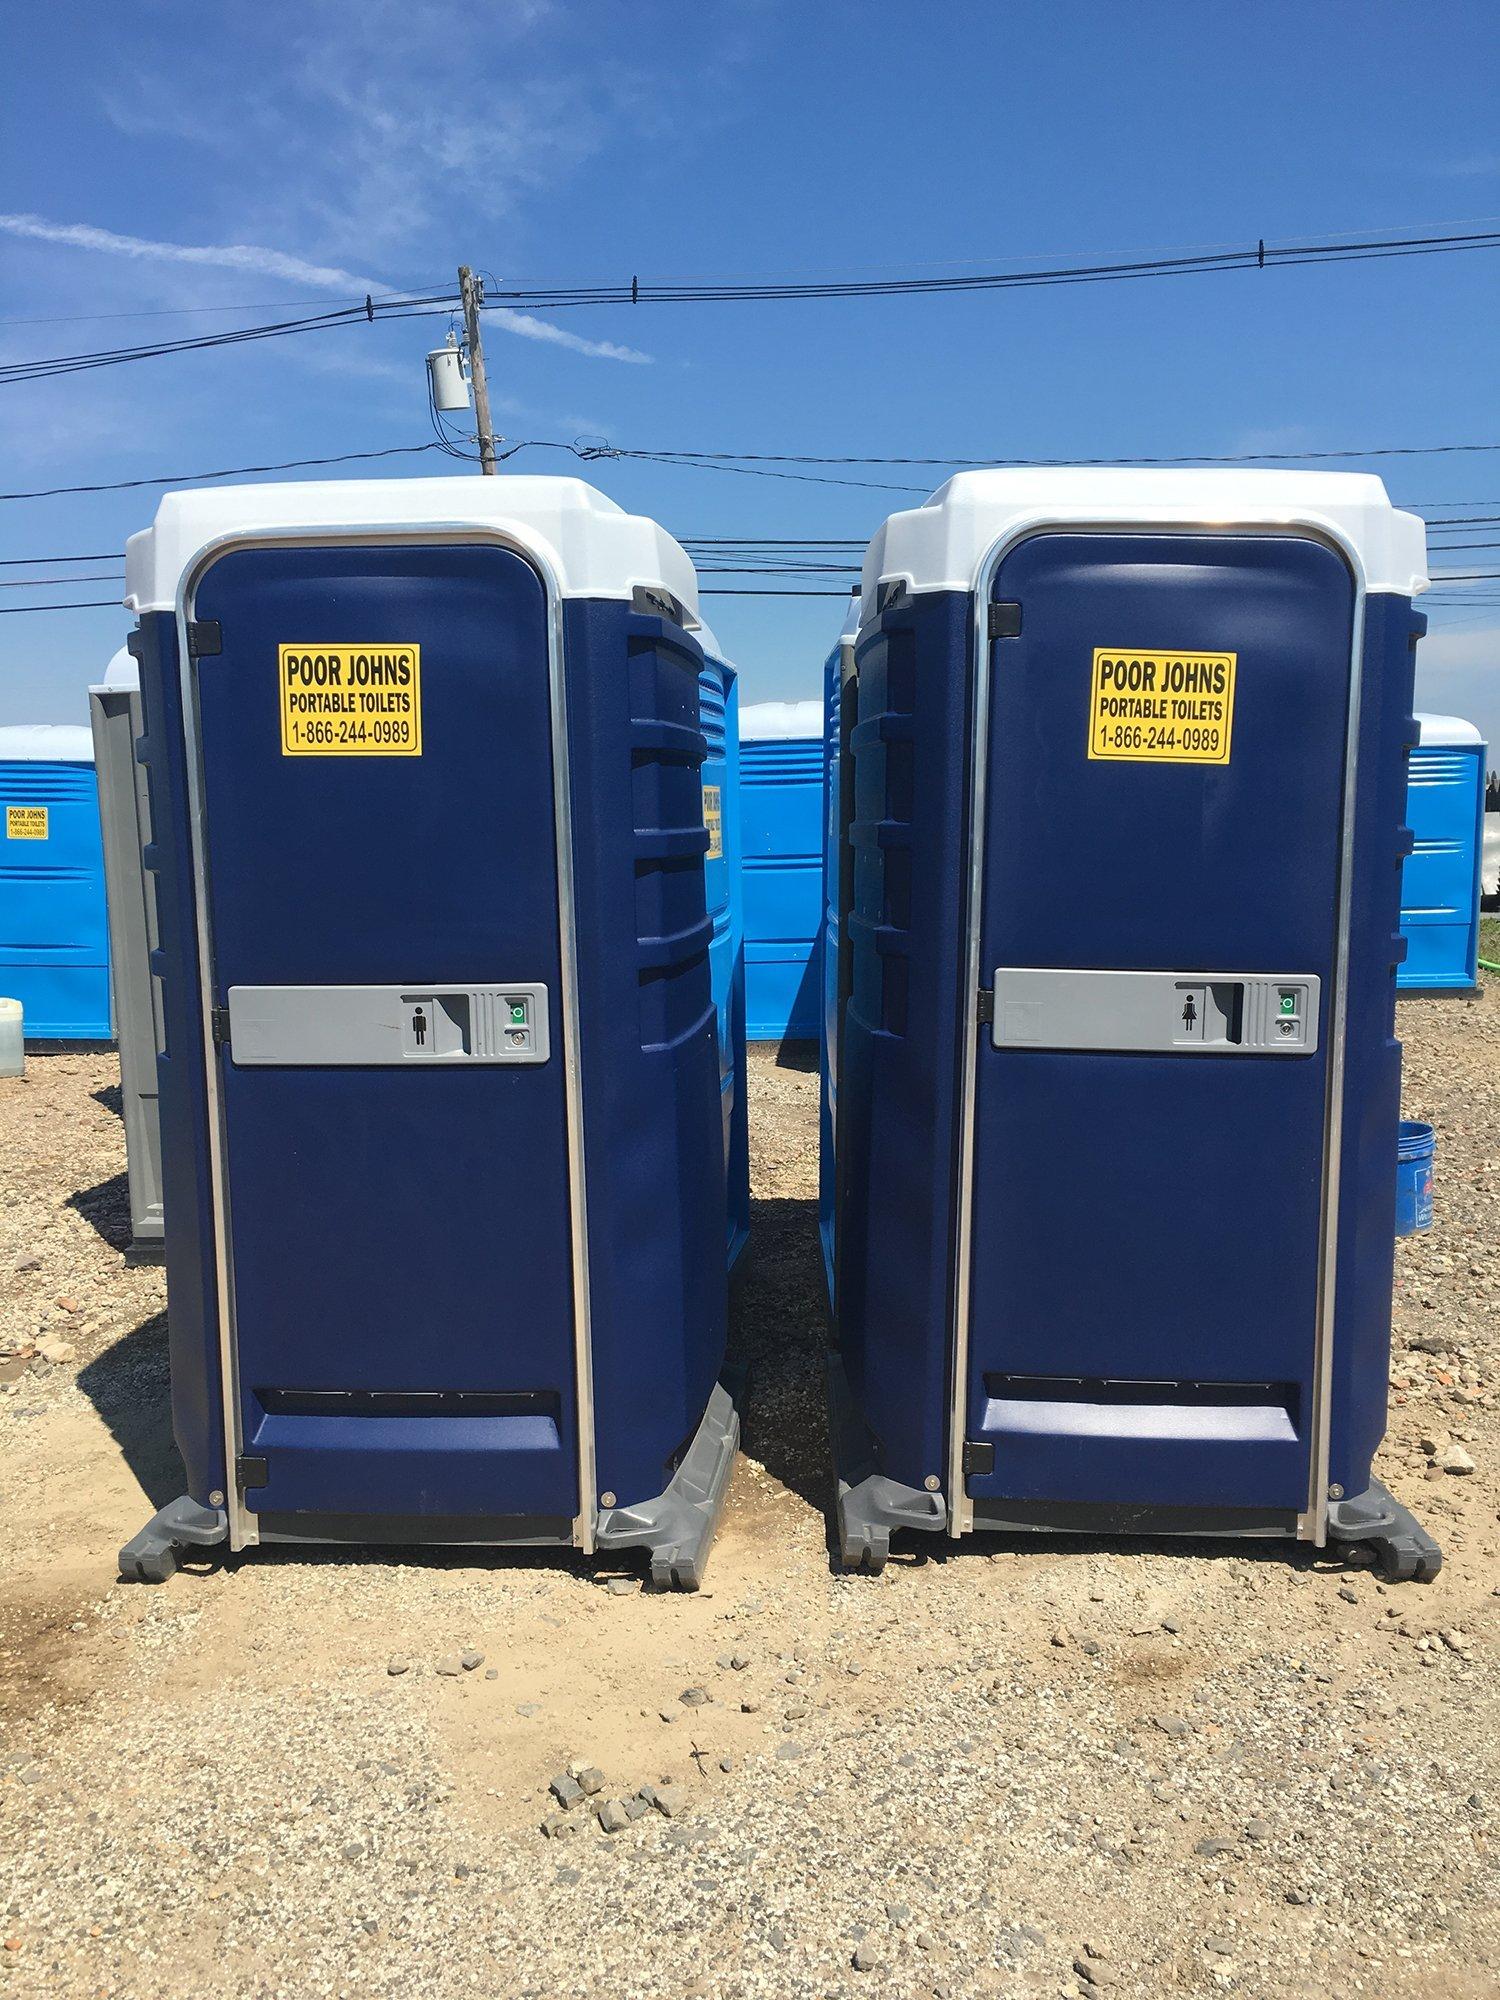 Poor John's Portable Toilets image 7